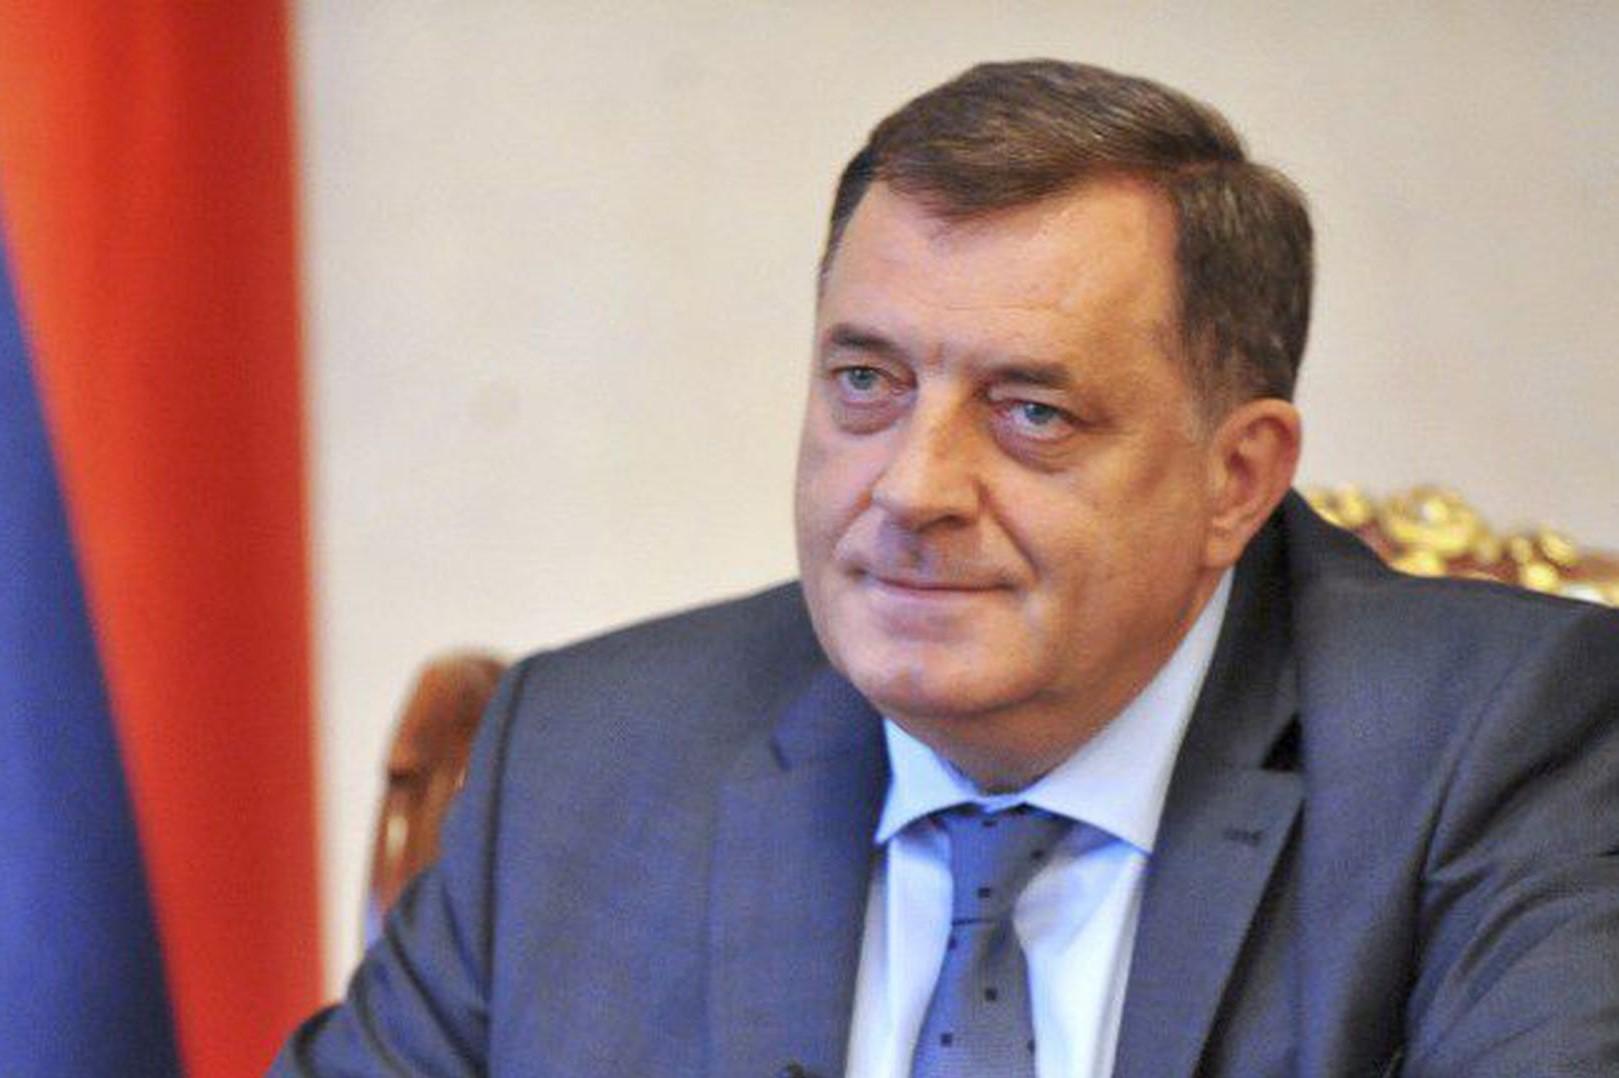 Will Milorad Dodik win elections for Serb seat in Bosnia-Herzegovina Presidency?